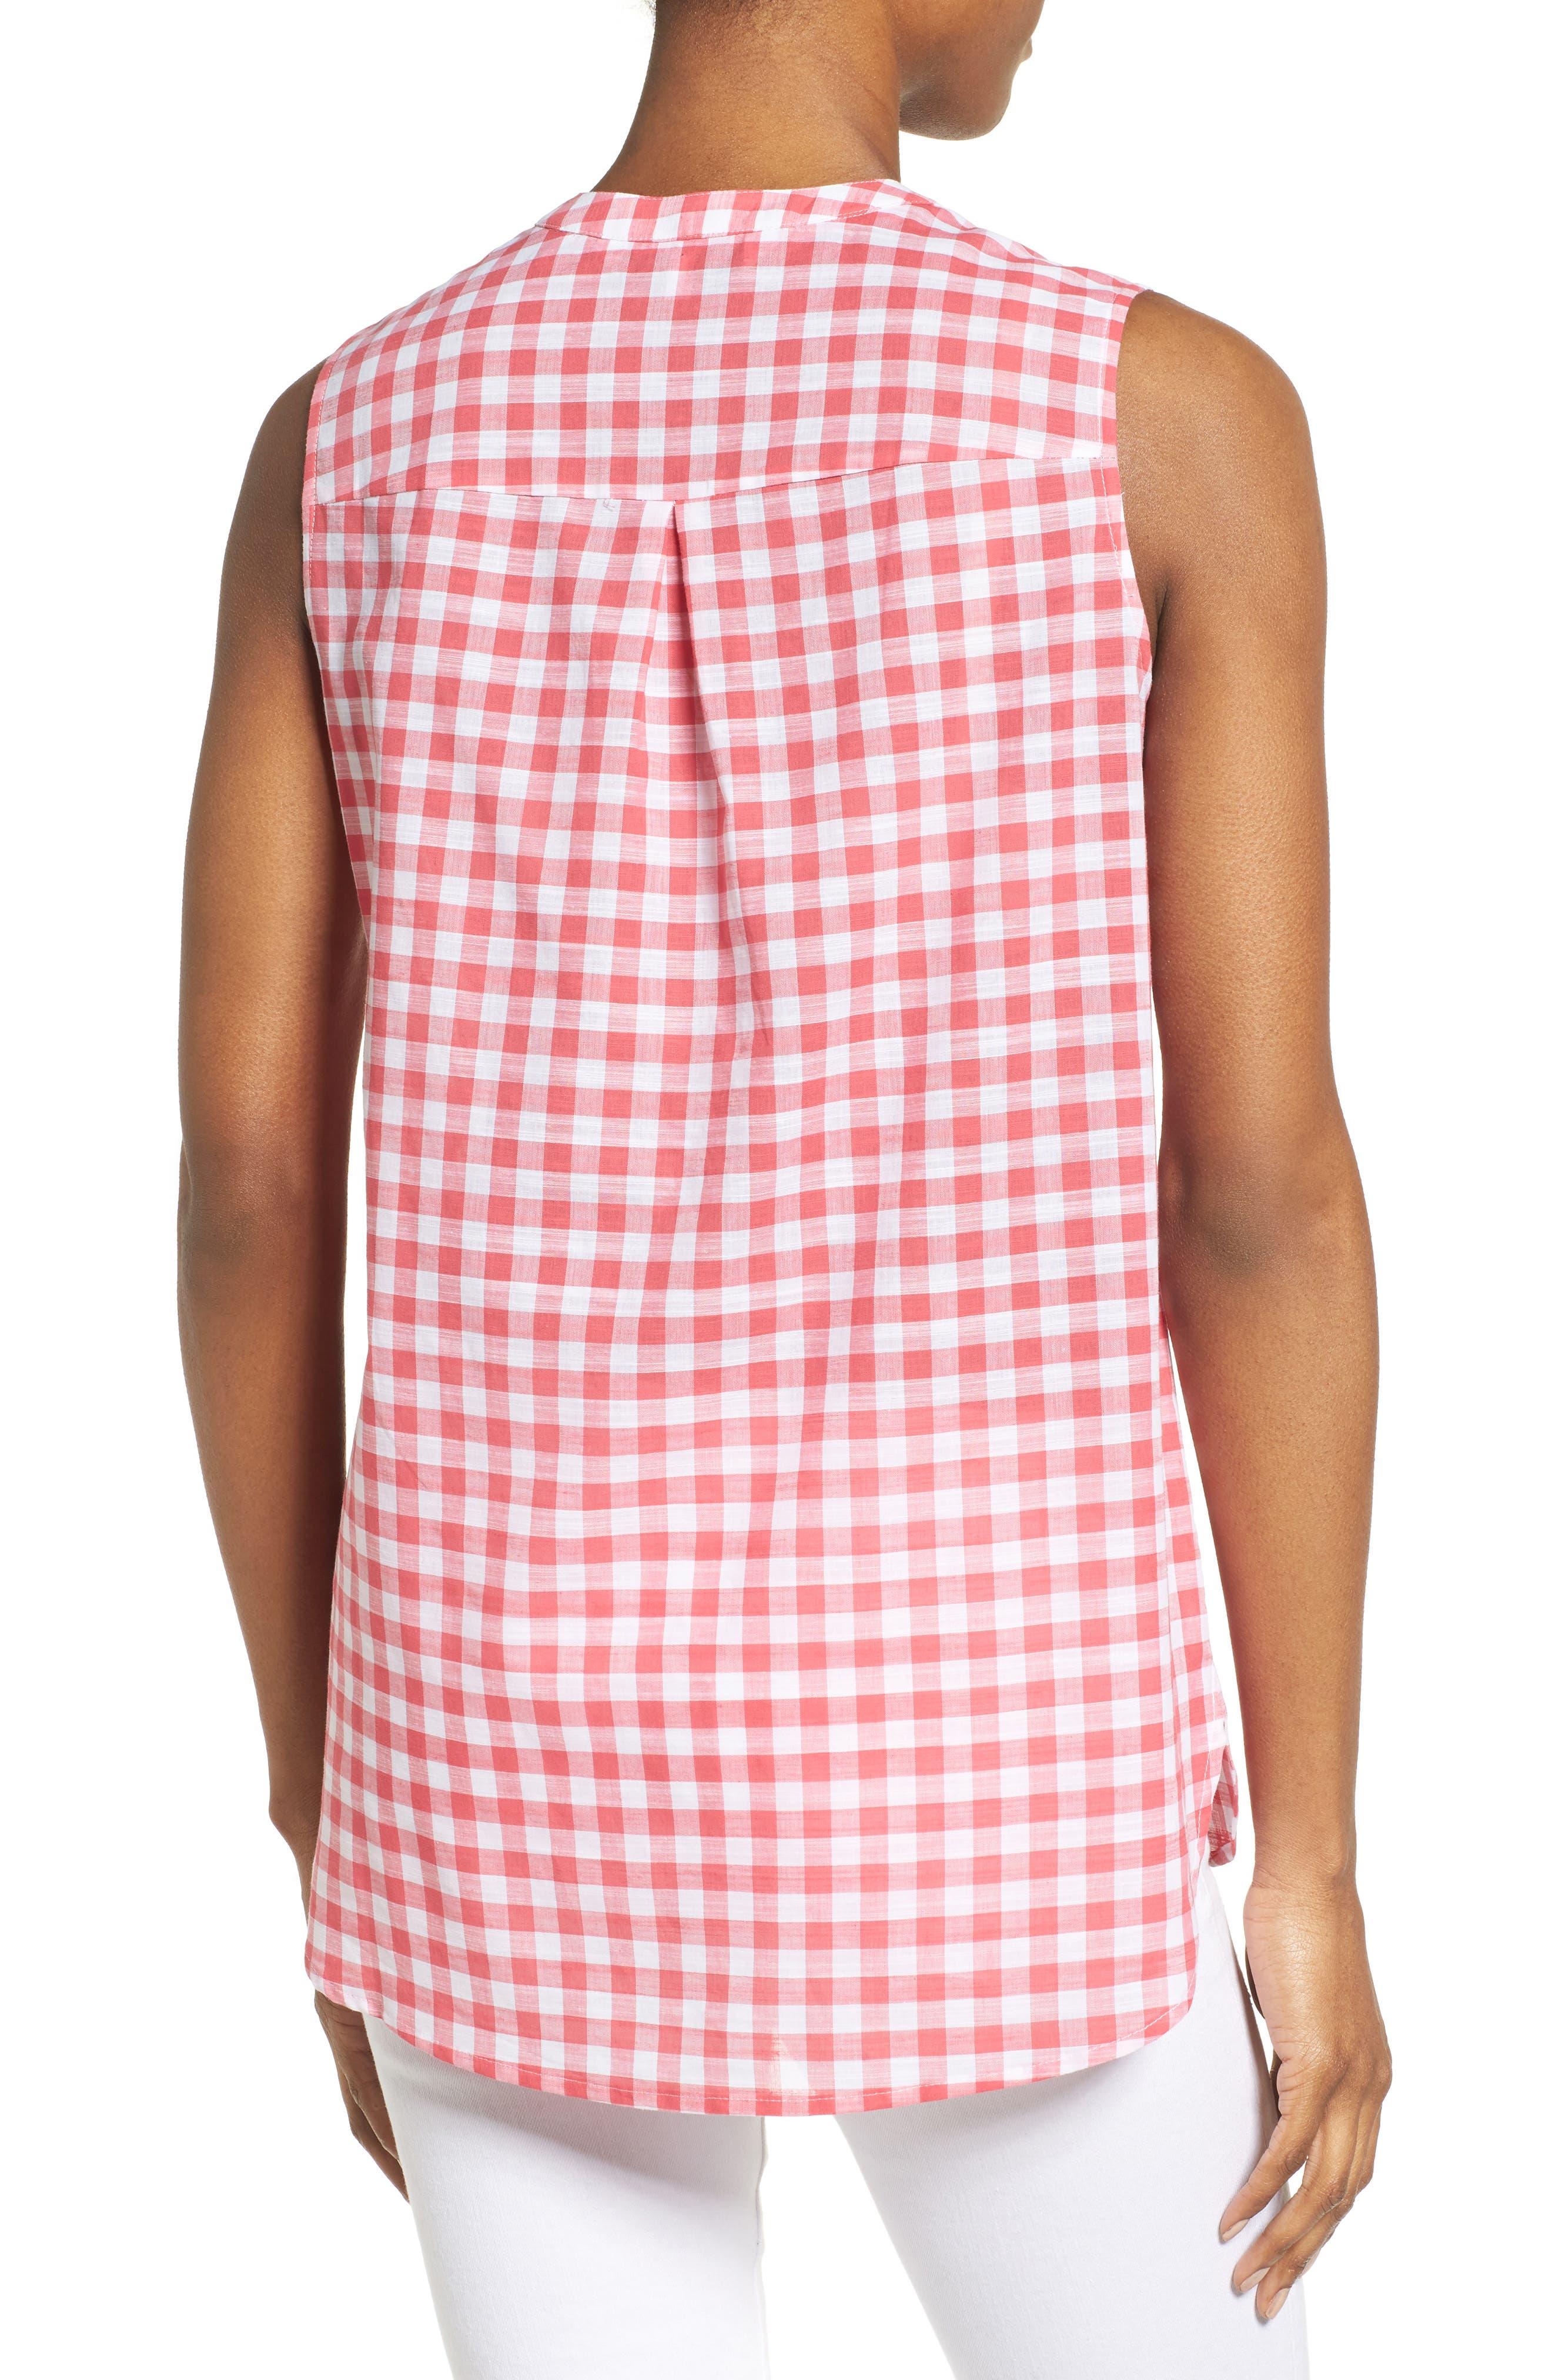 Alternate Image 2  - Foxcroft Gingham Sleeveless Shirt (Regular & Petites)